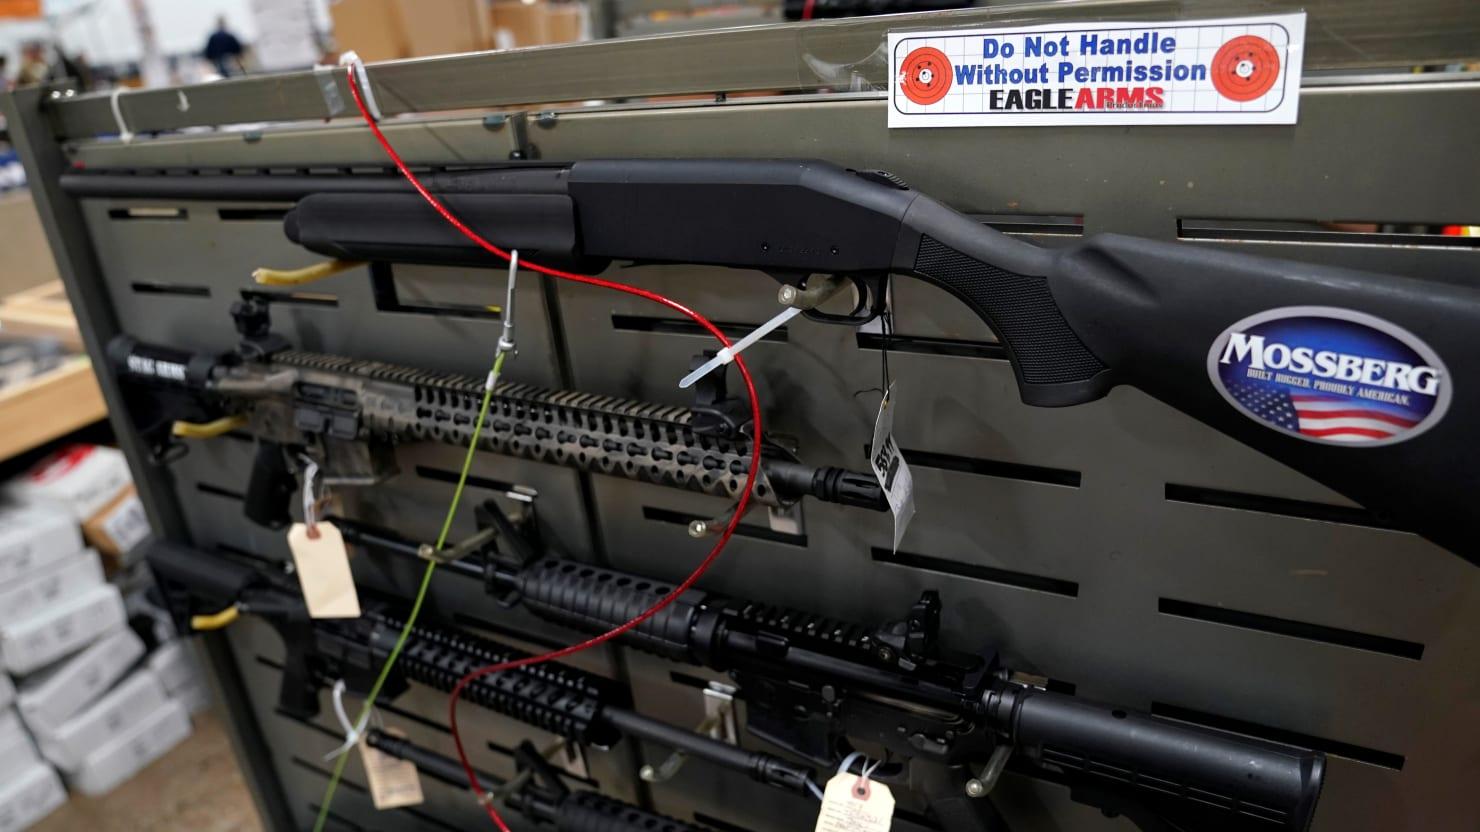 Trump makes gun sales easier abroad